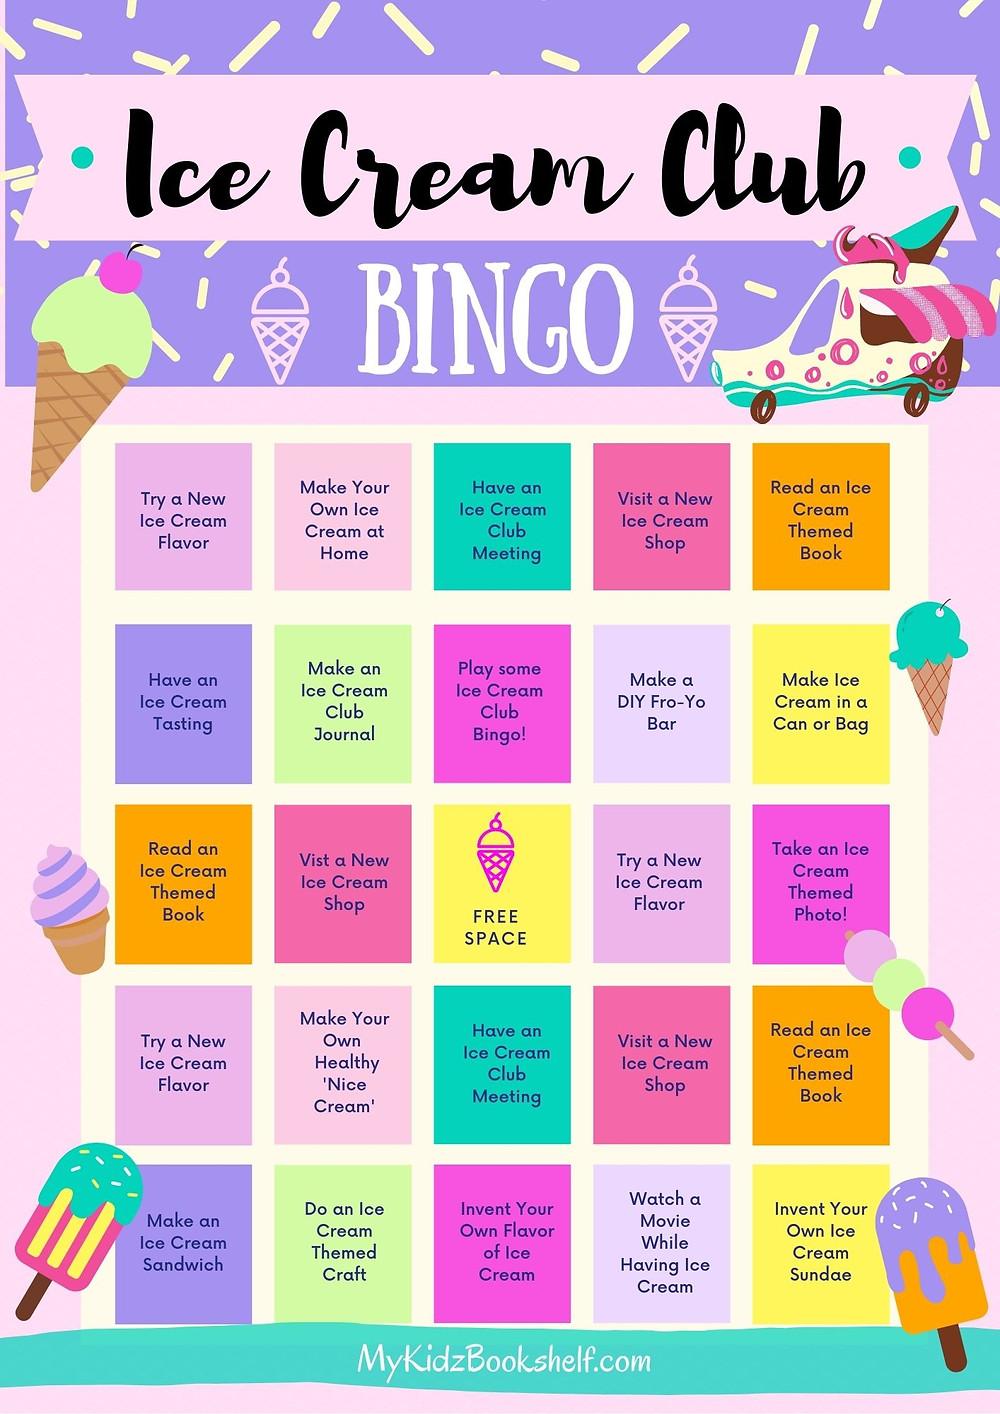 Ice Cream Club BINGO card printable